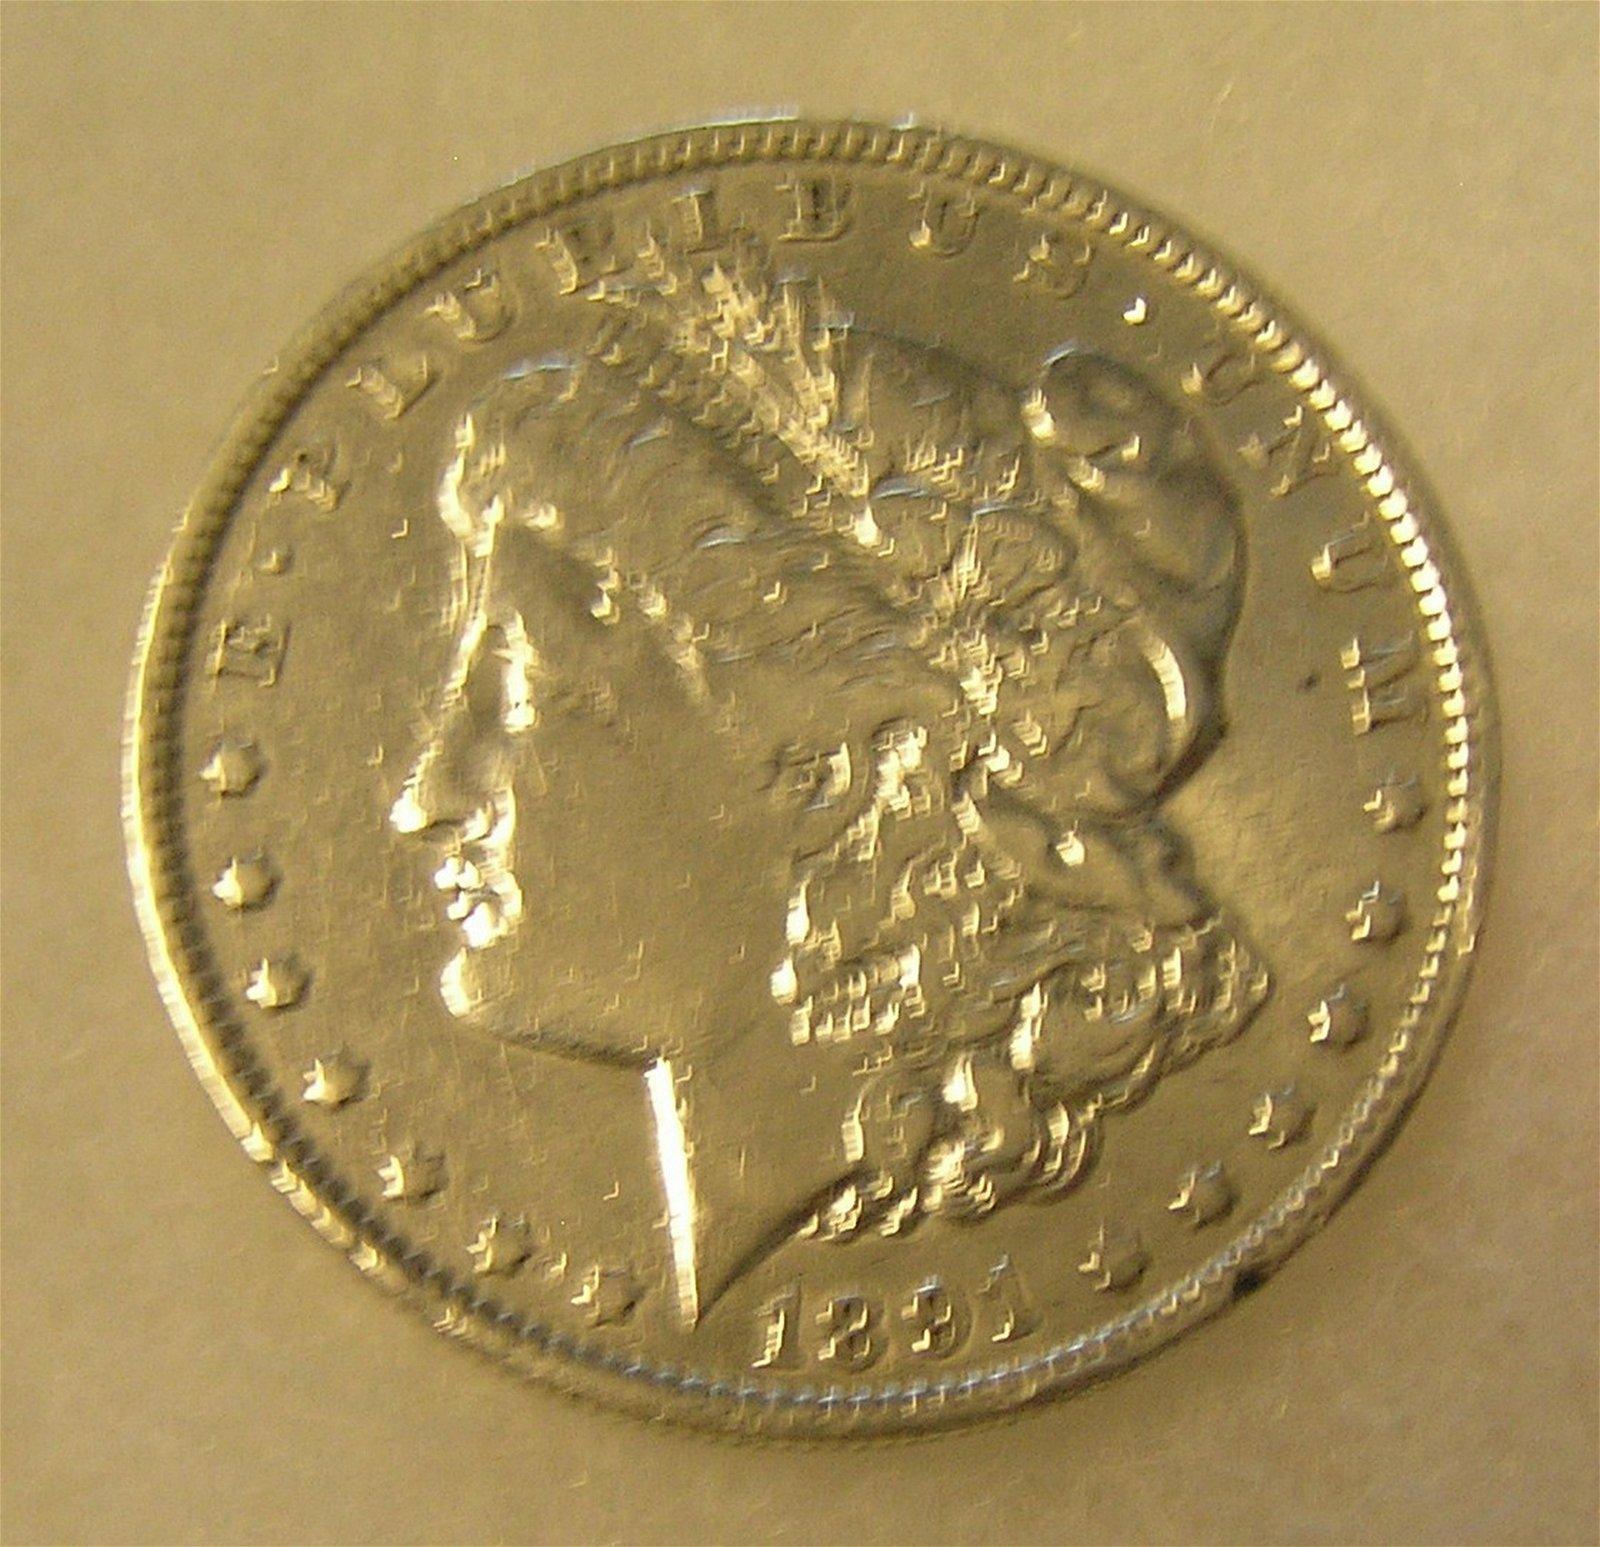 1891-O Morgan silver dollar in fine condition